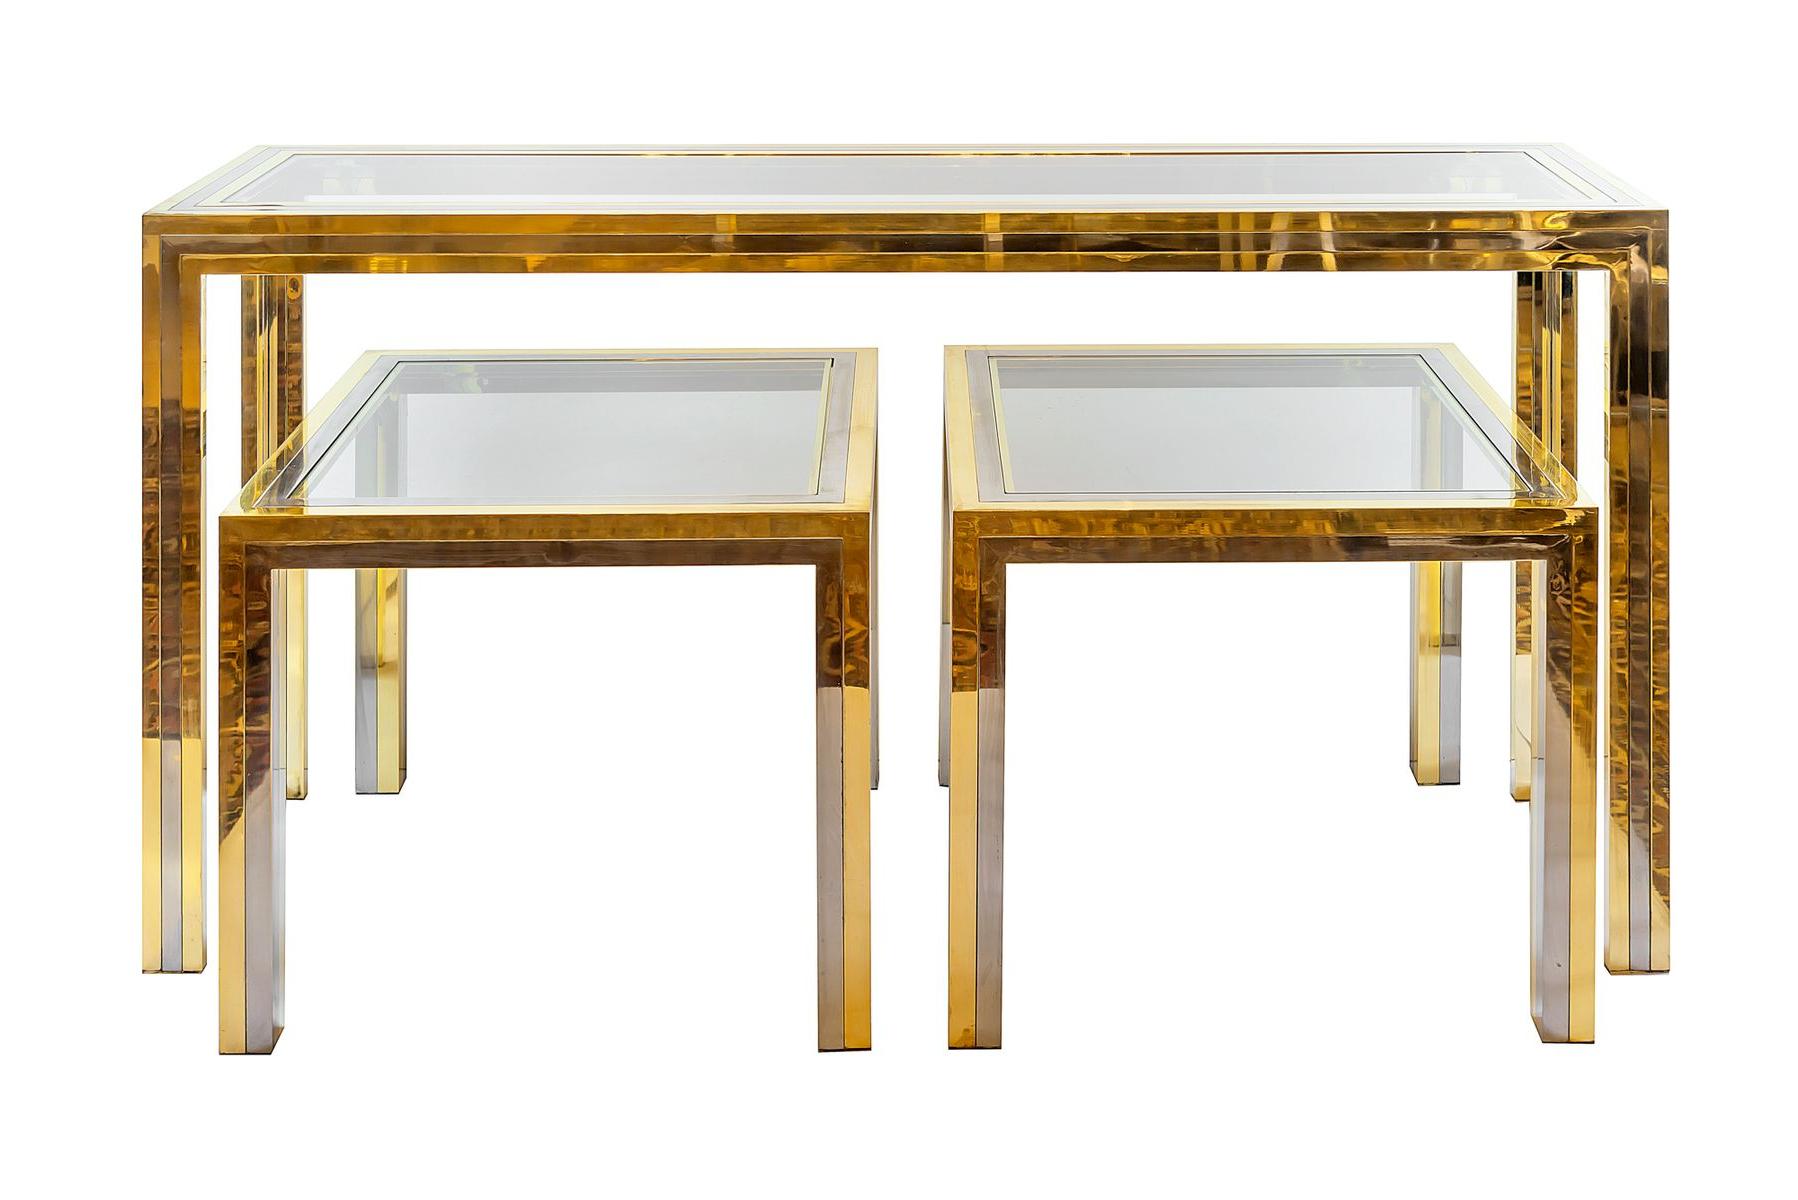 Mid Century Italian Brass & Chrome Console & 2 Side Tables, 1960s Regarding Era Limestone Console Tables (View 14 of 20)